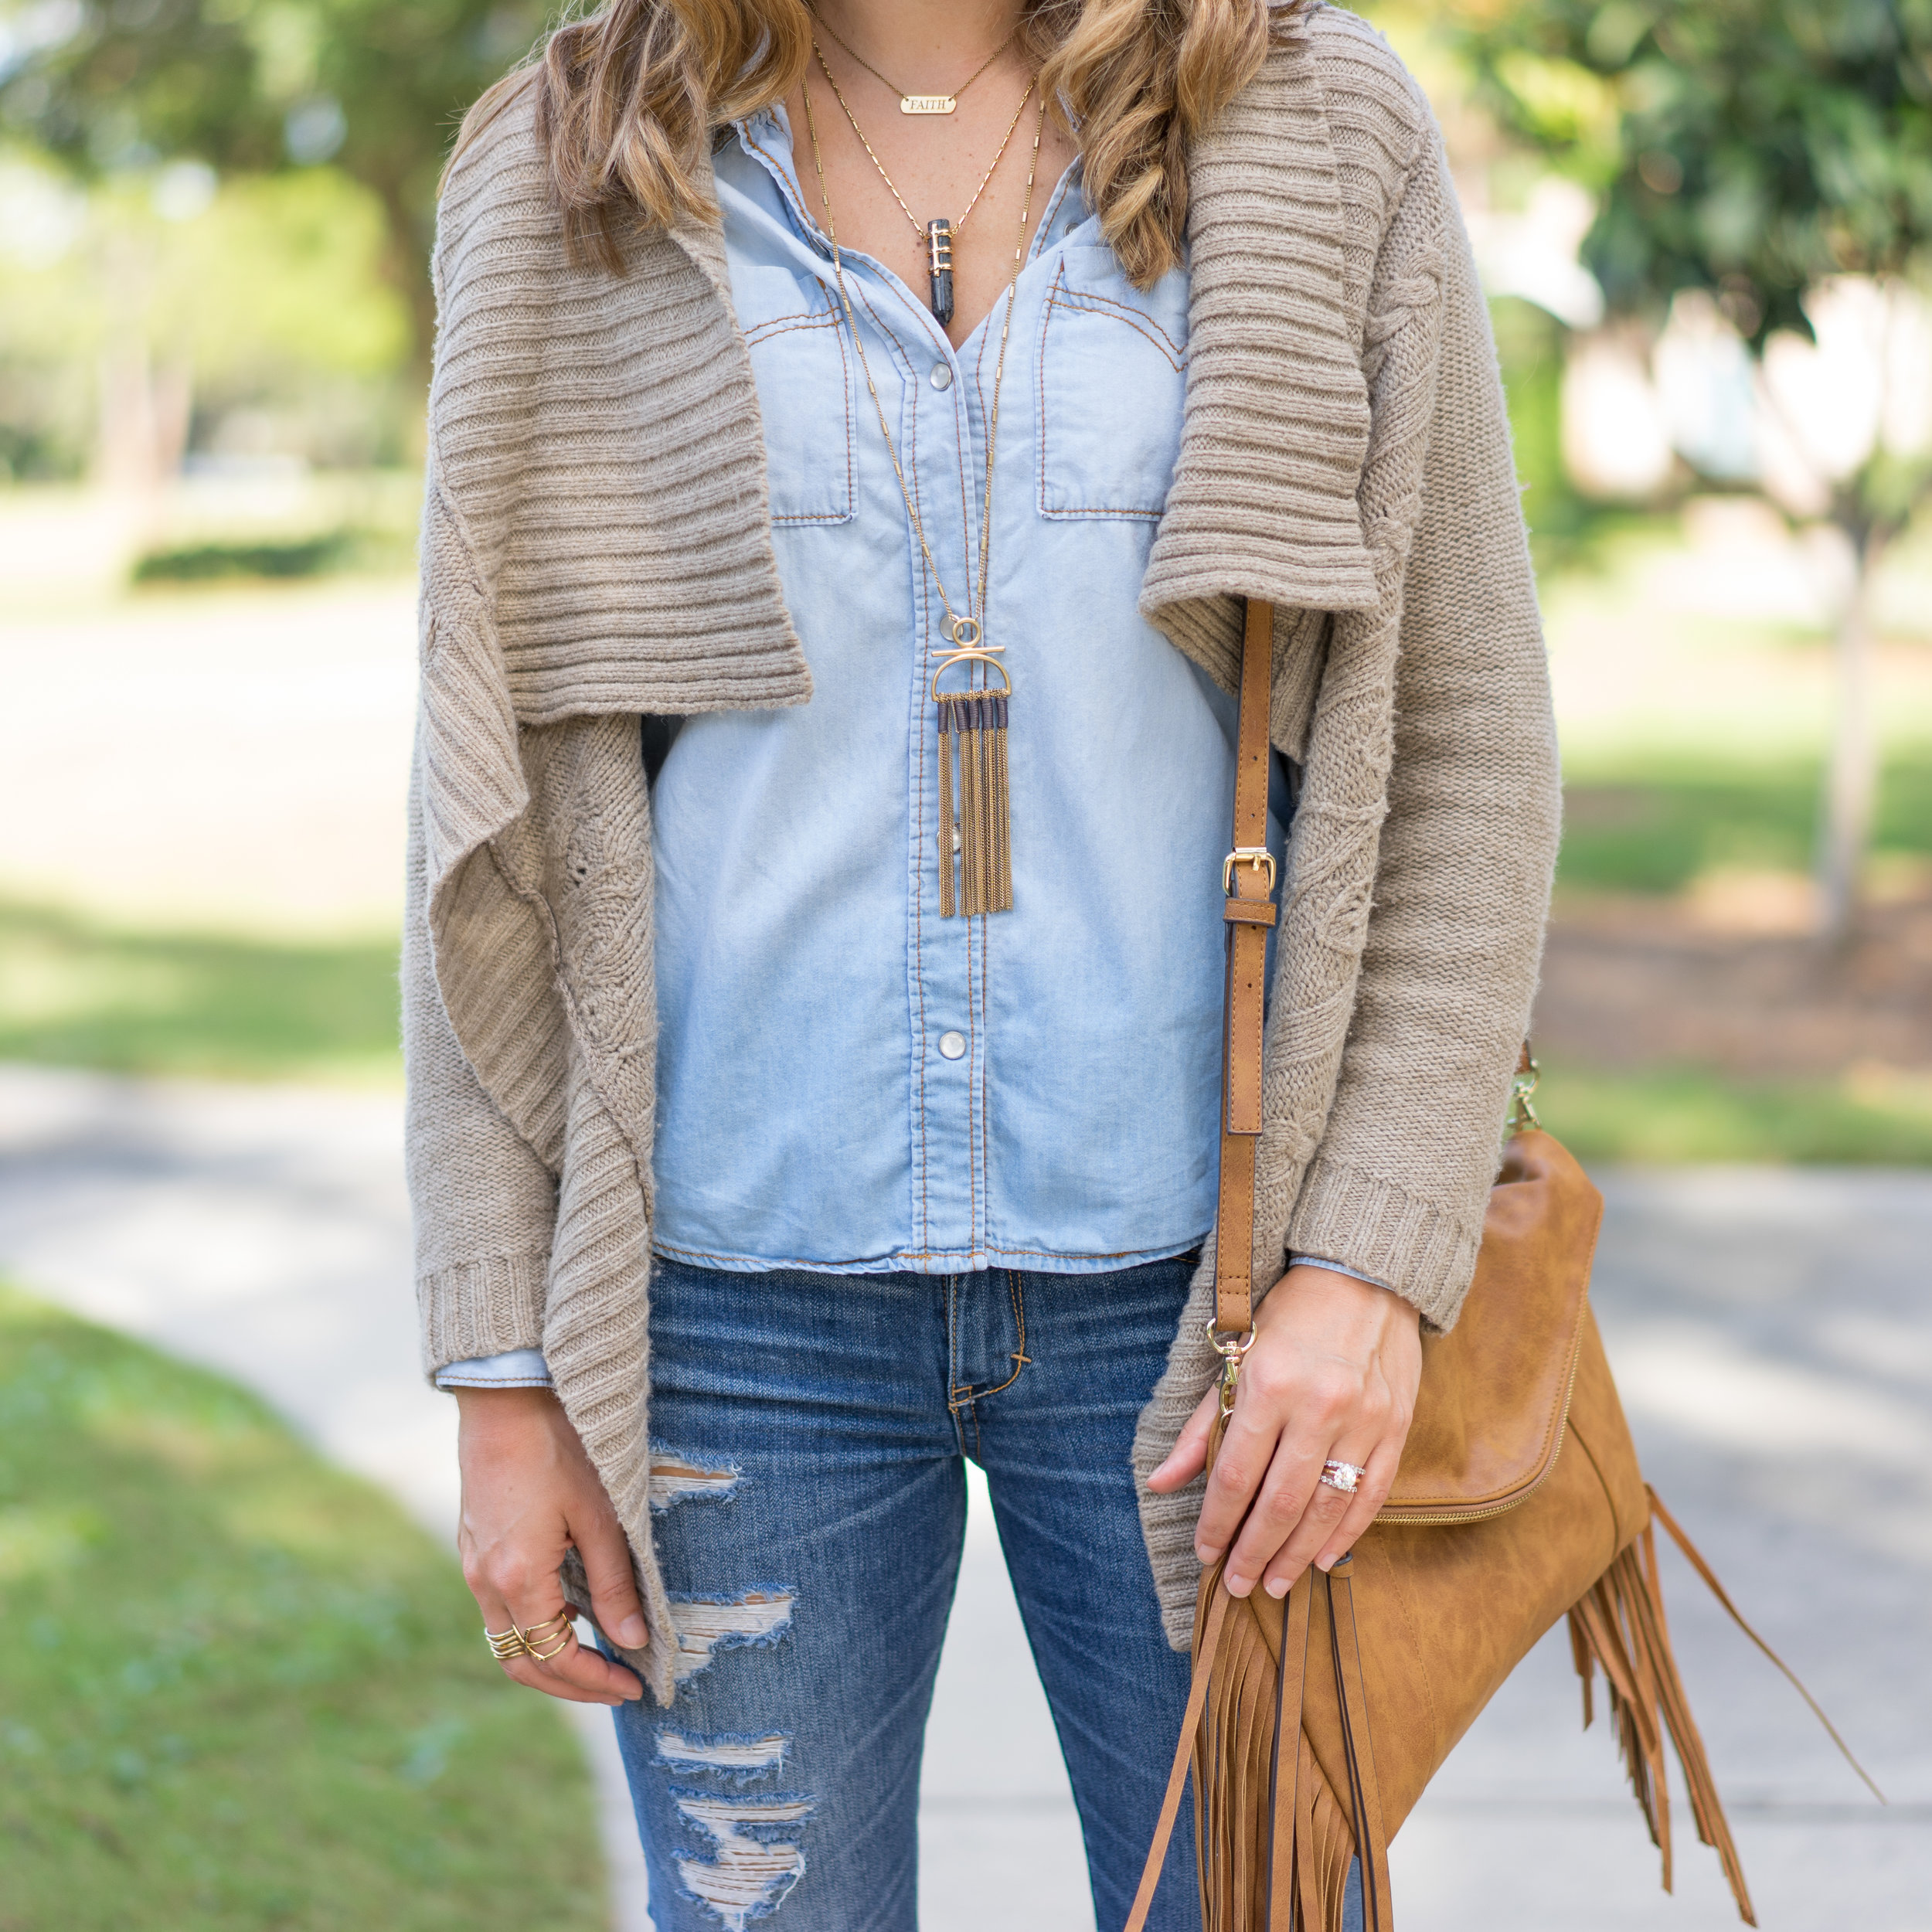 Cozy sweater, chambray shirt, fringe purse